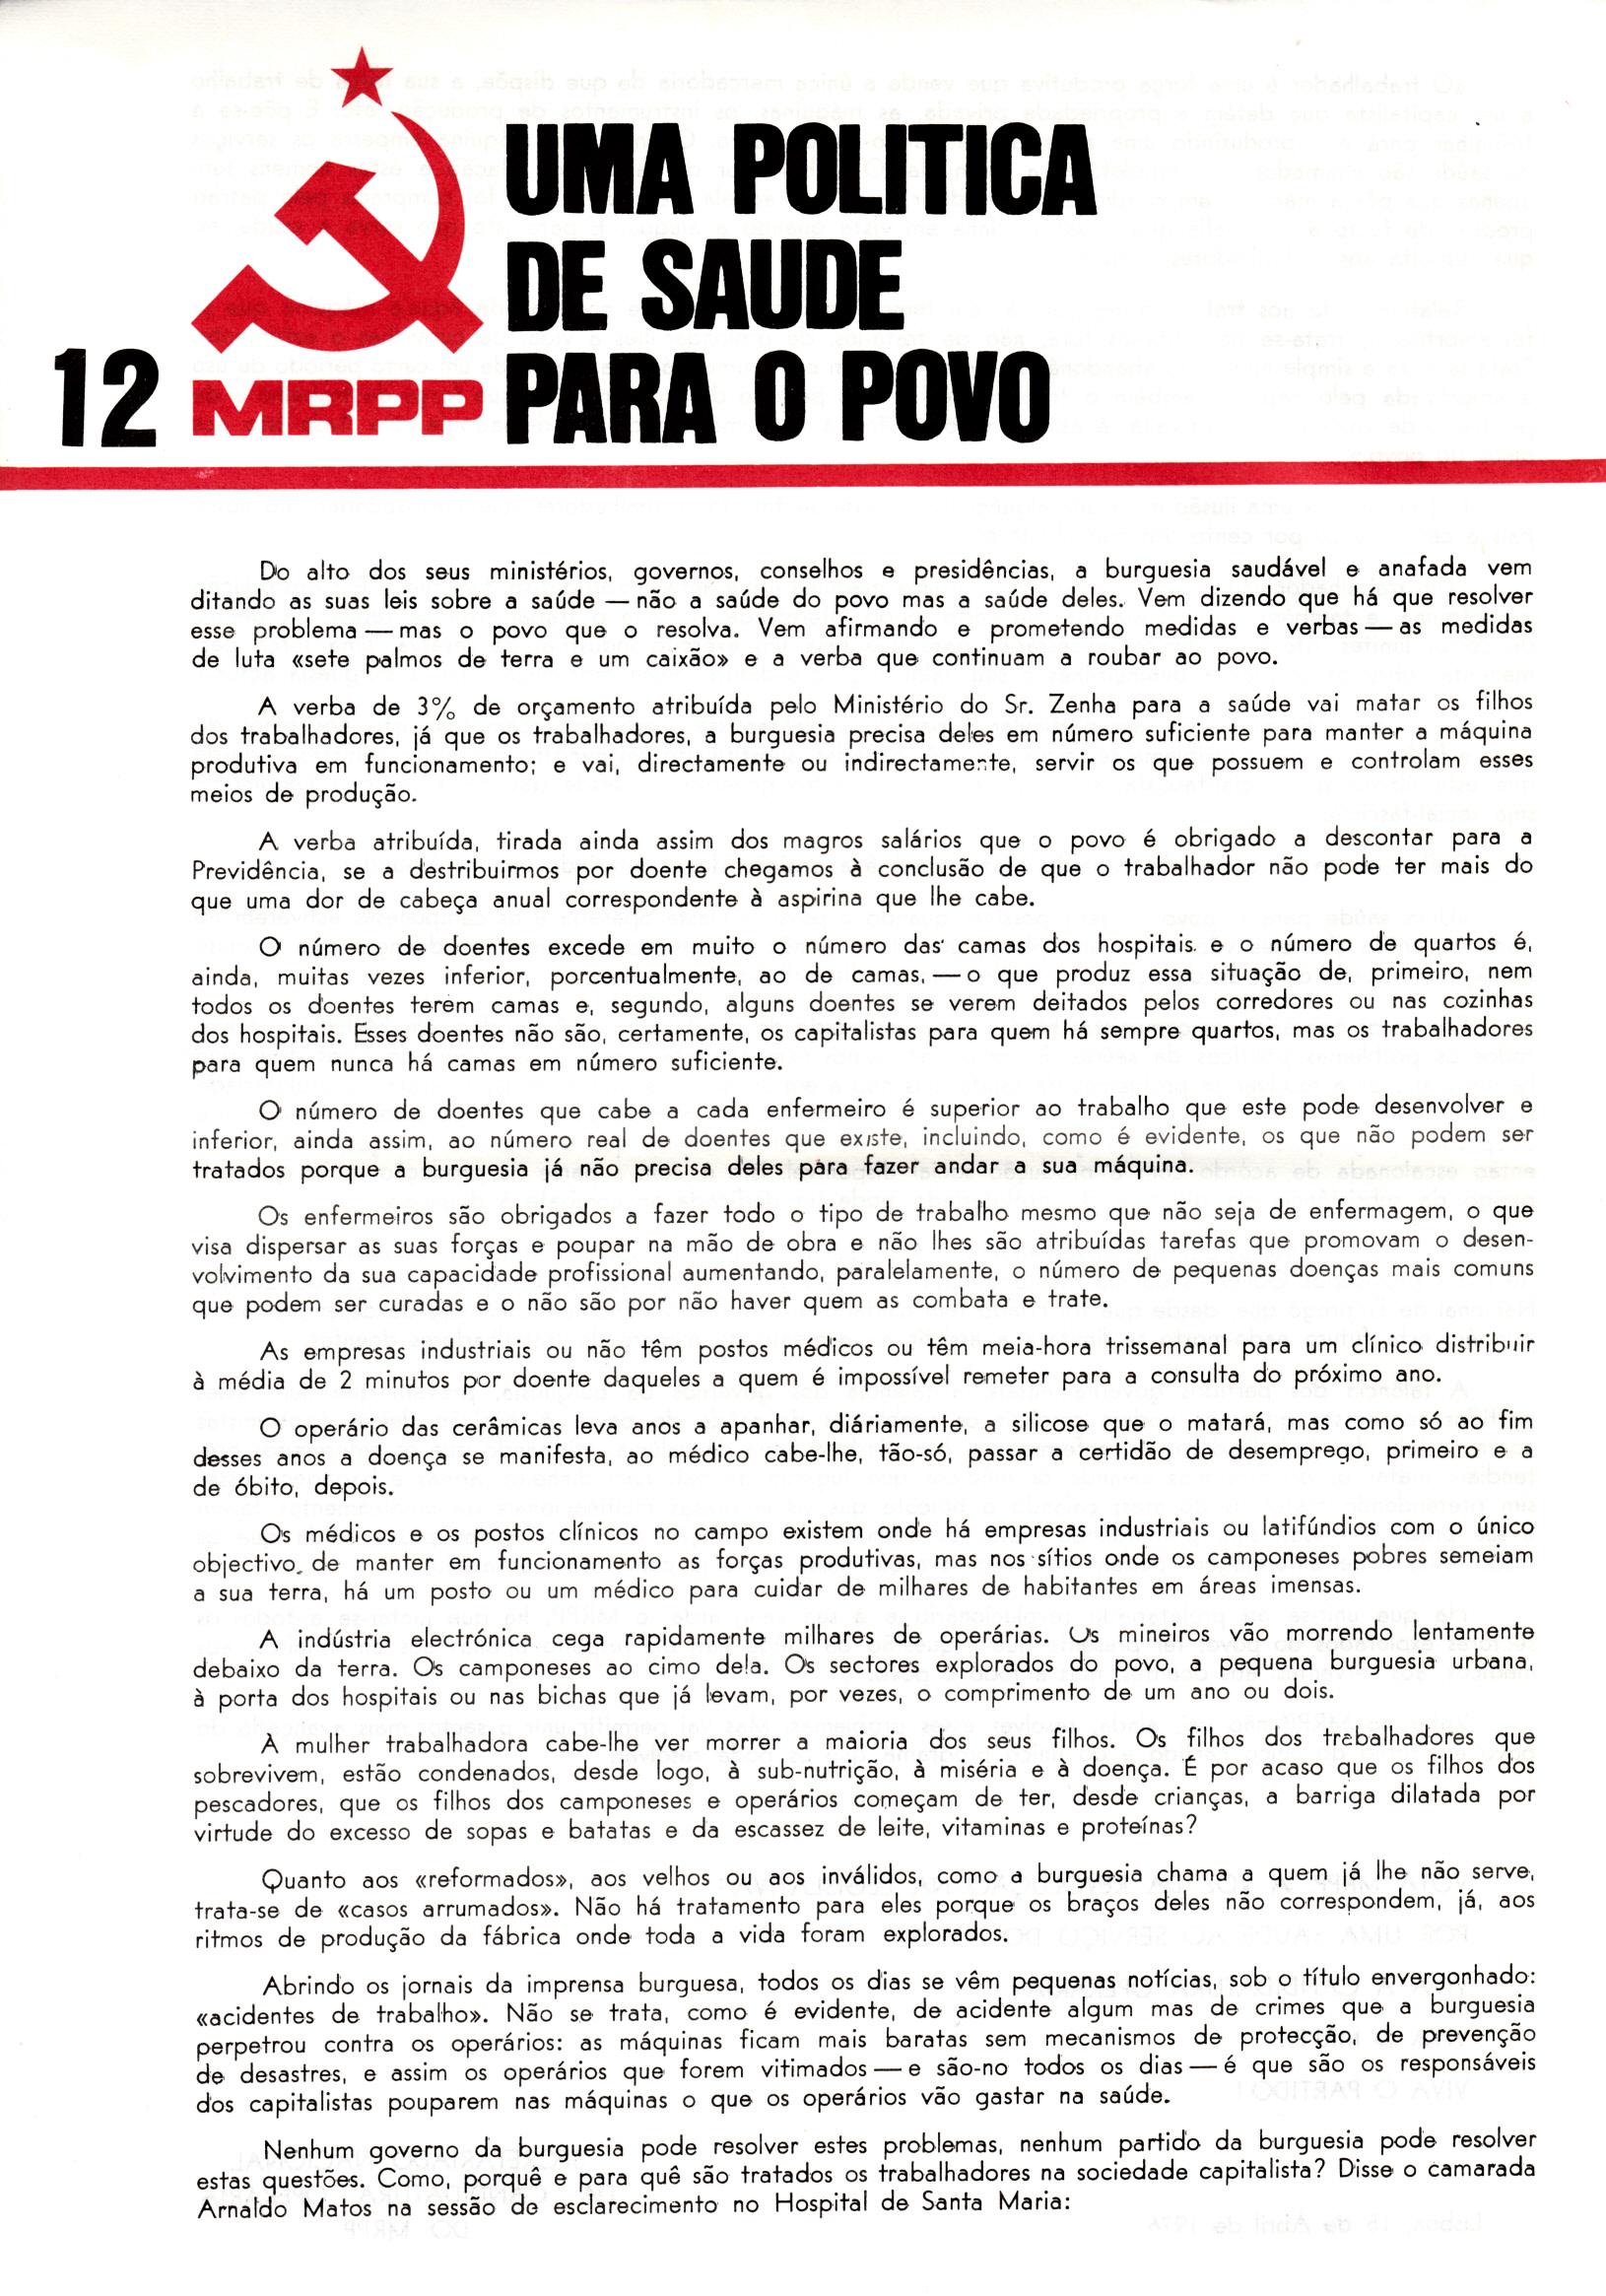 mrpp_1976_eleicao_programa_0023